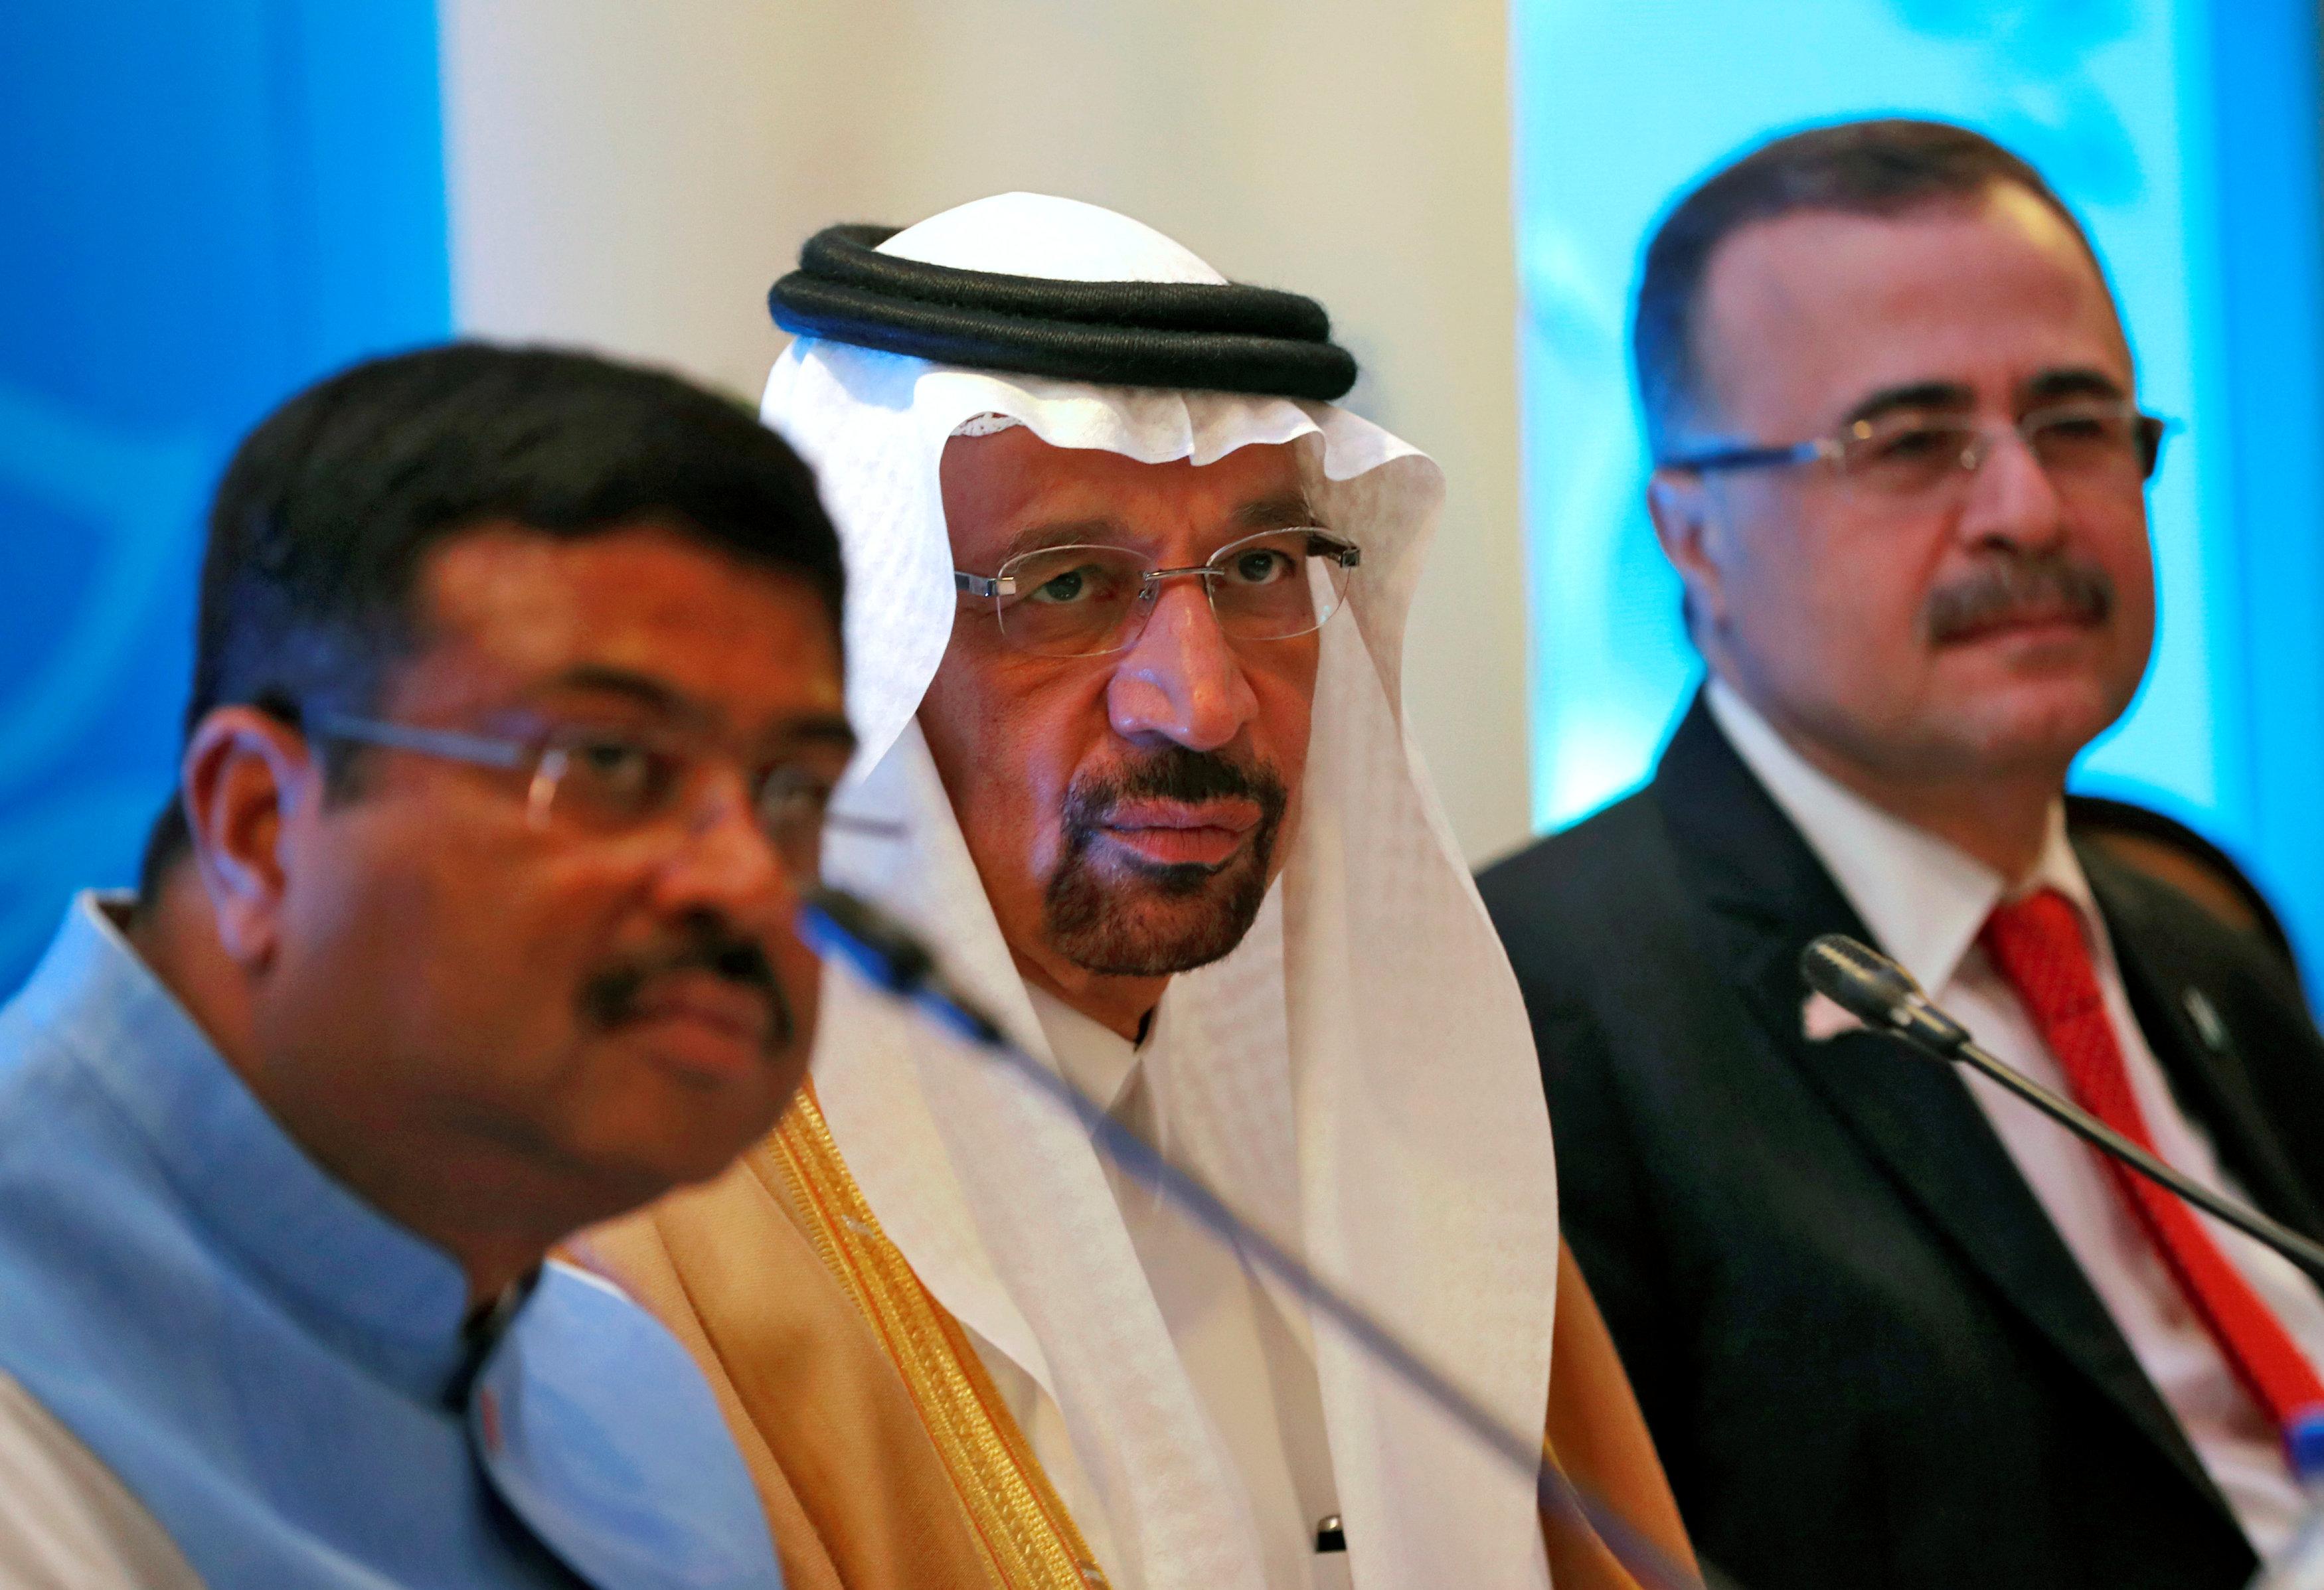 Saudi Arabia's $44 Billion Refinery Plan in India Faces Farmer Opposition